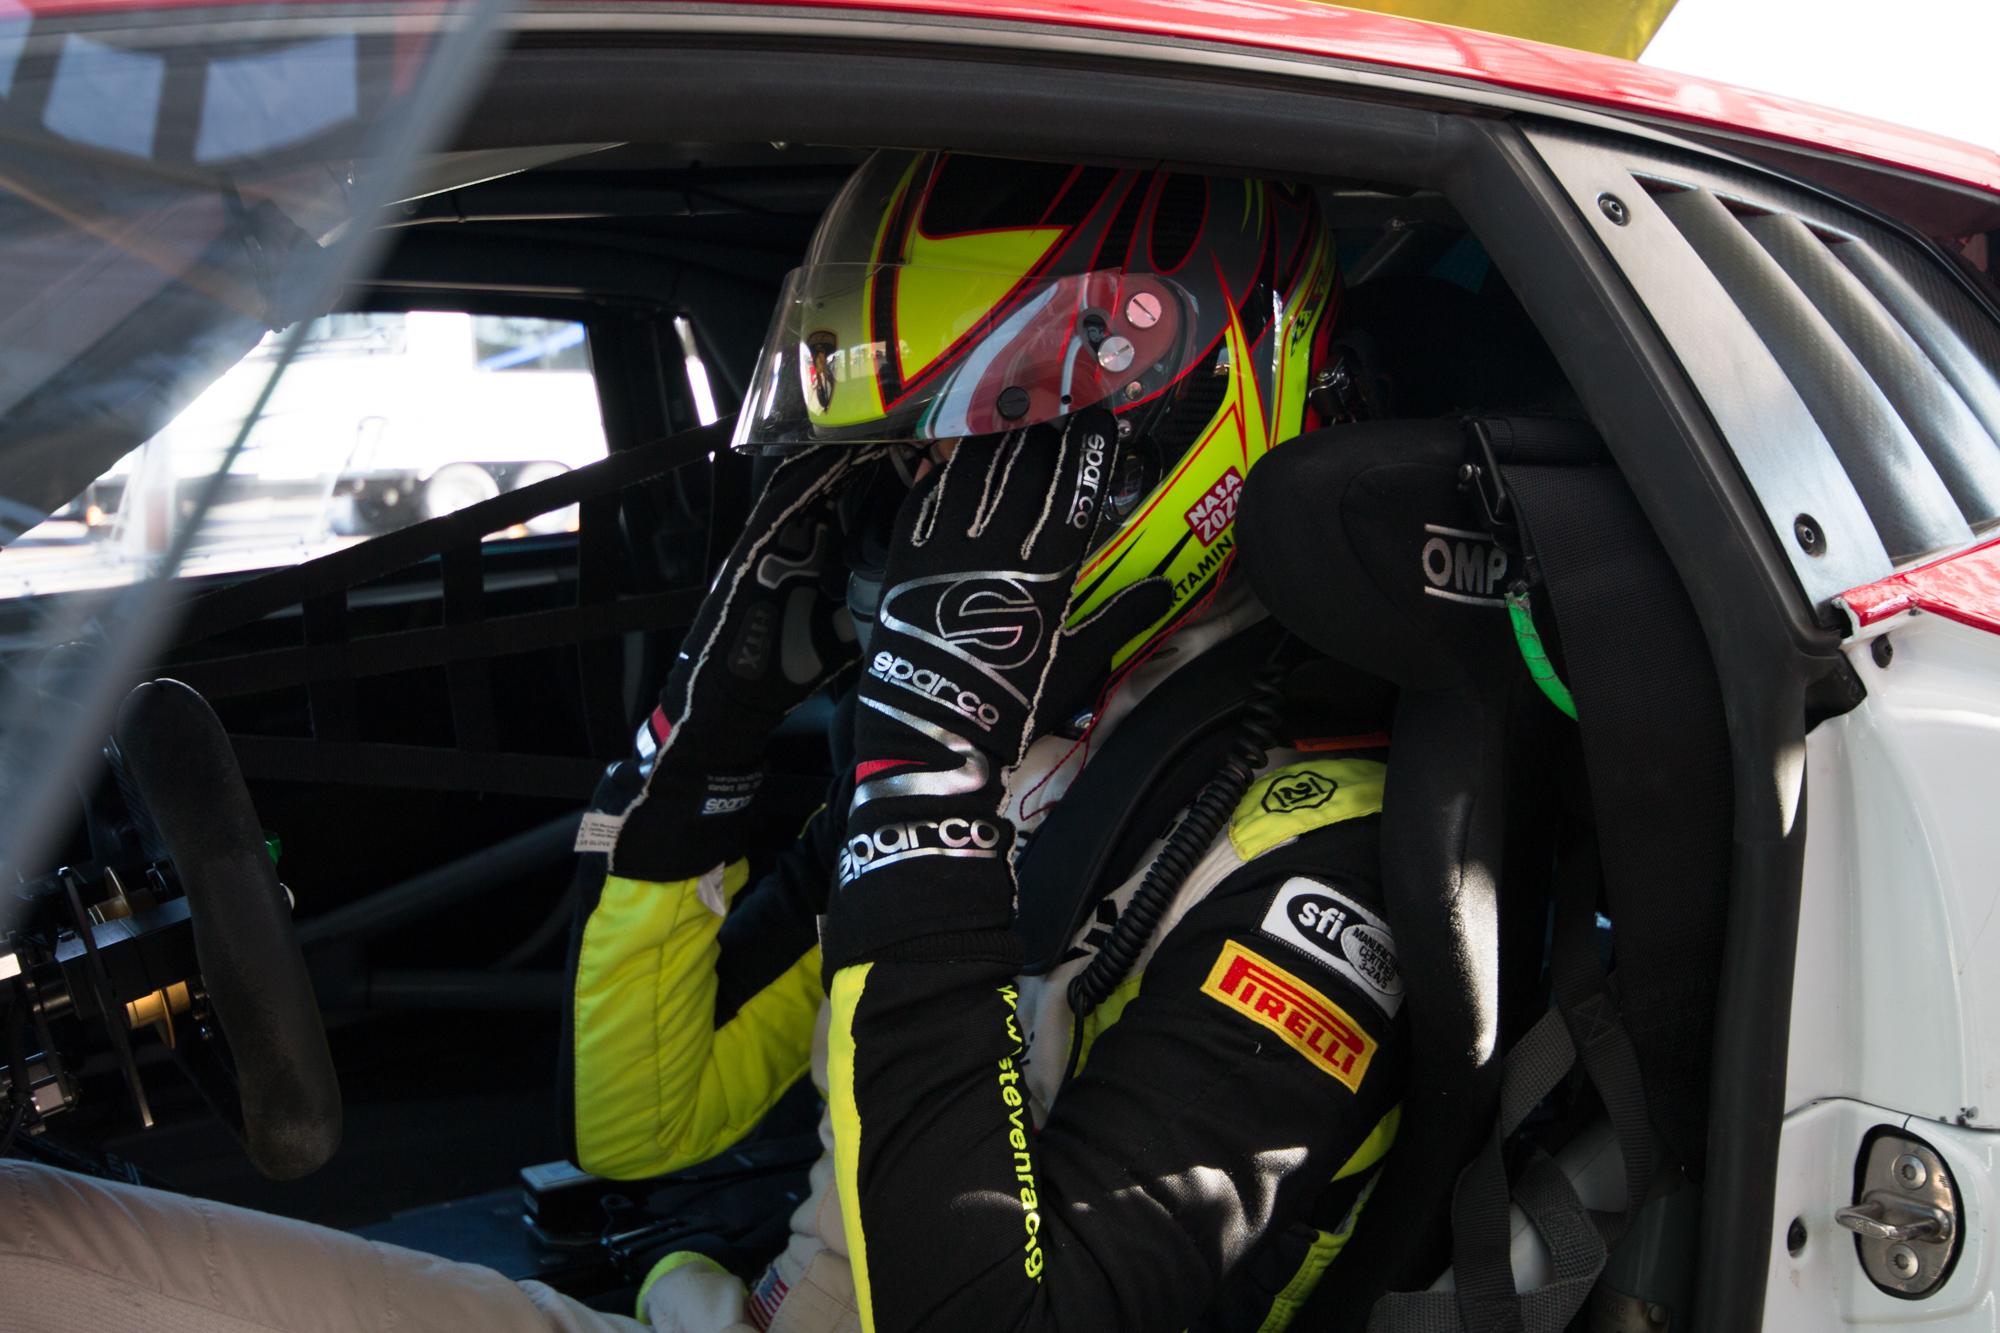 Steven-Racing-20130204-44718.jpg